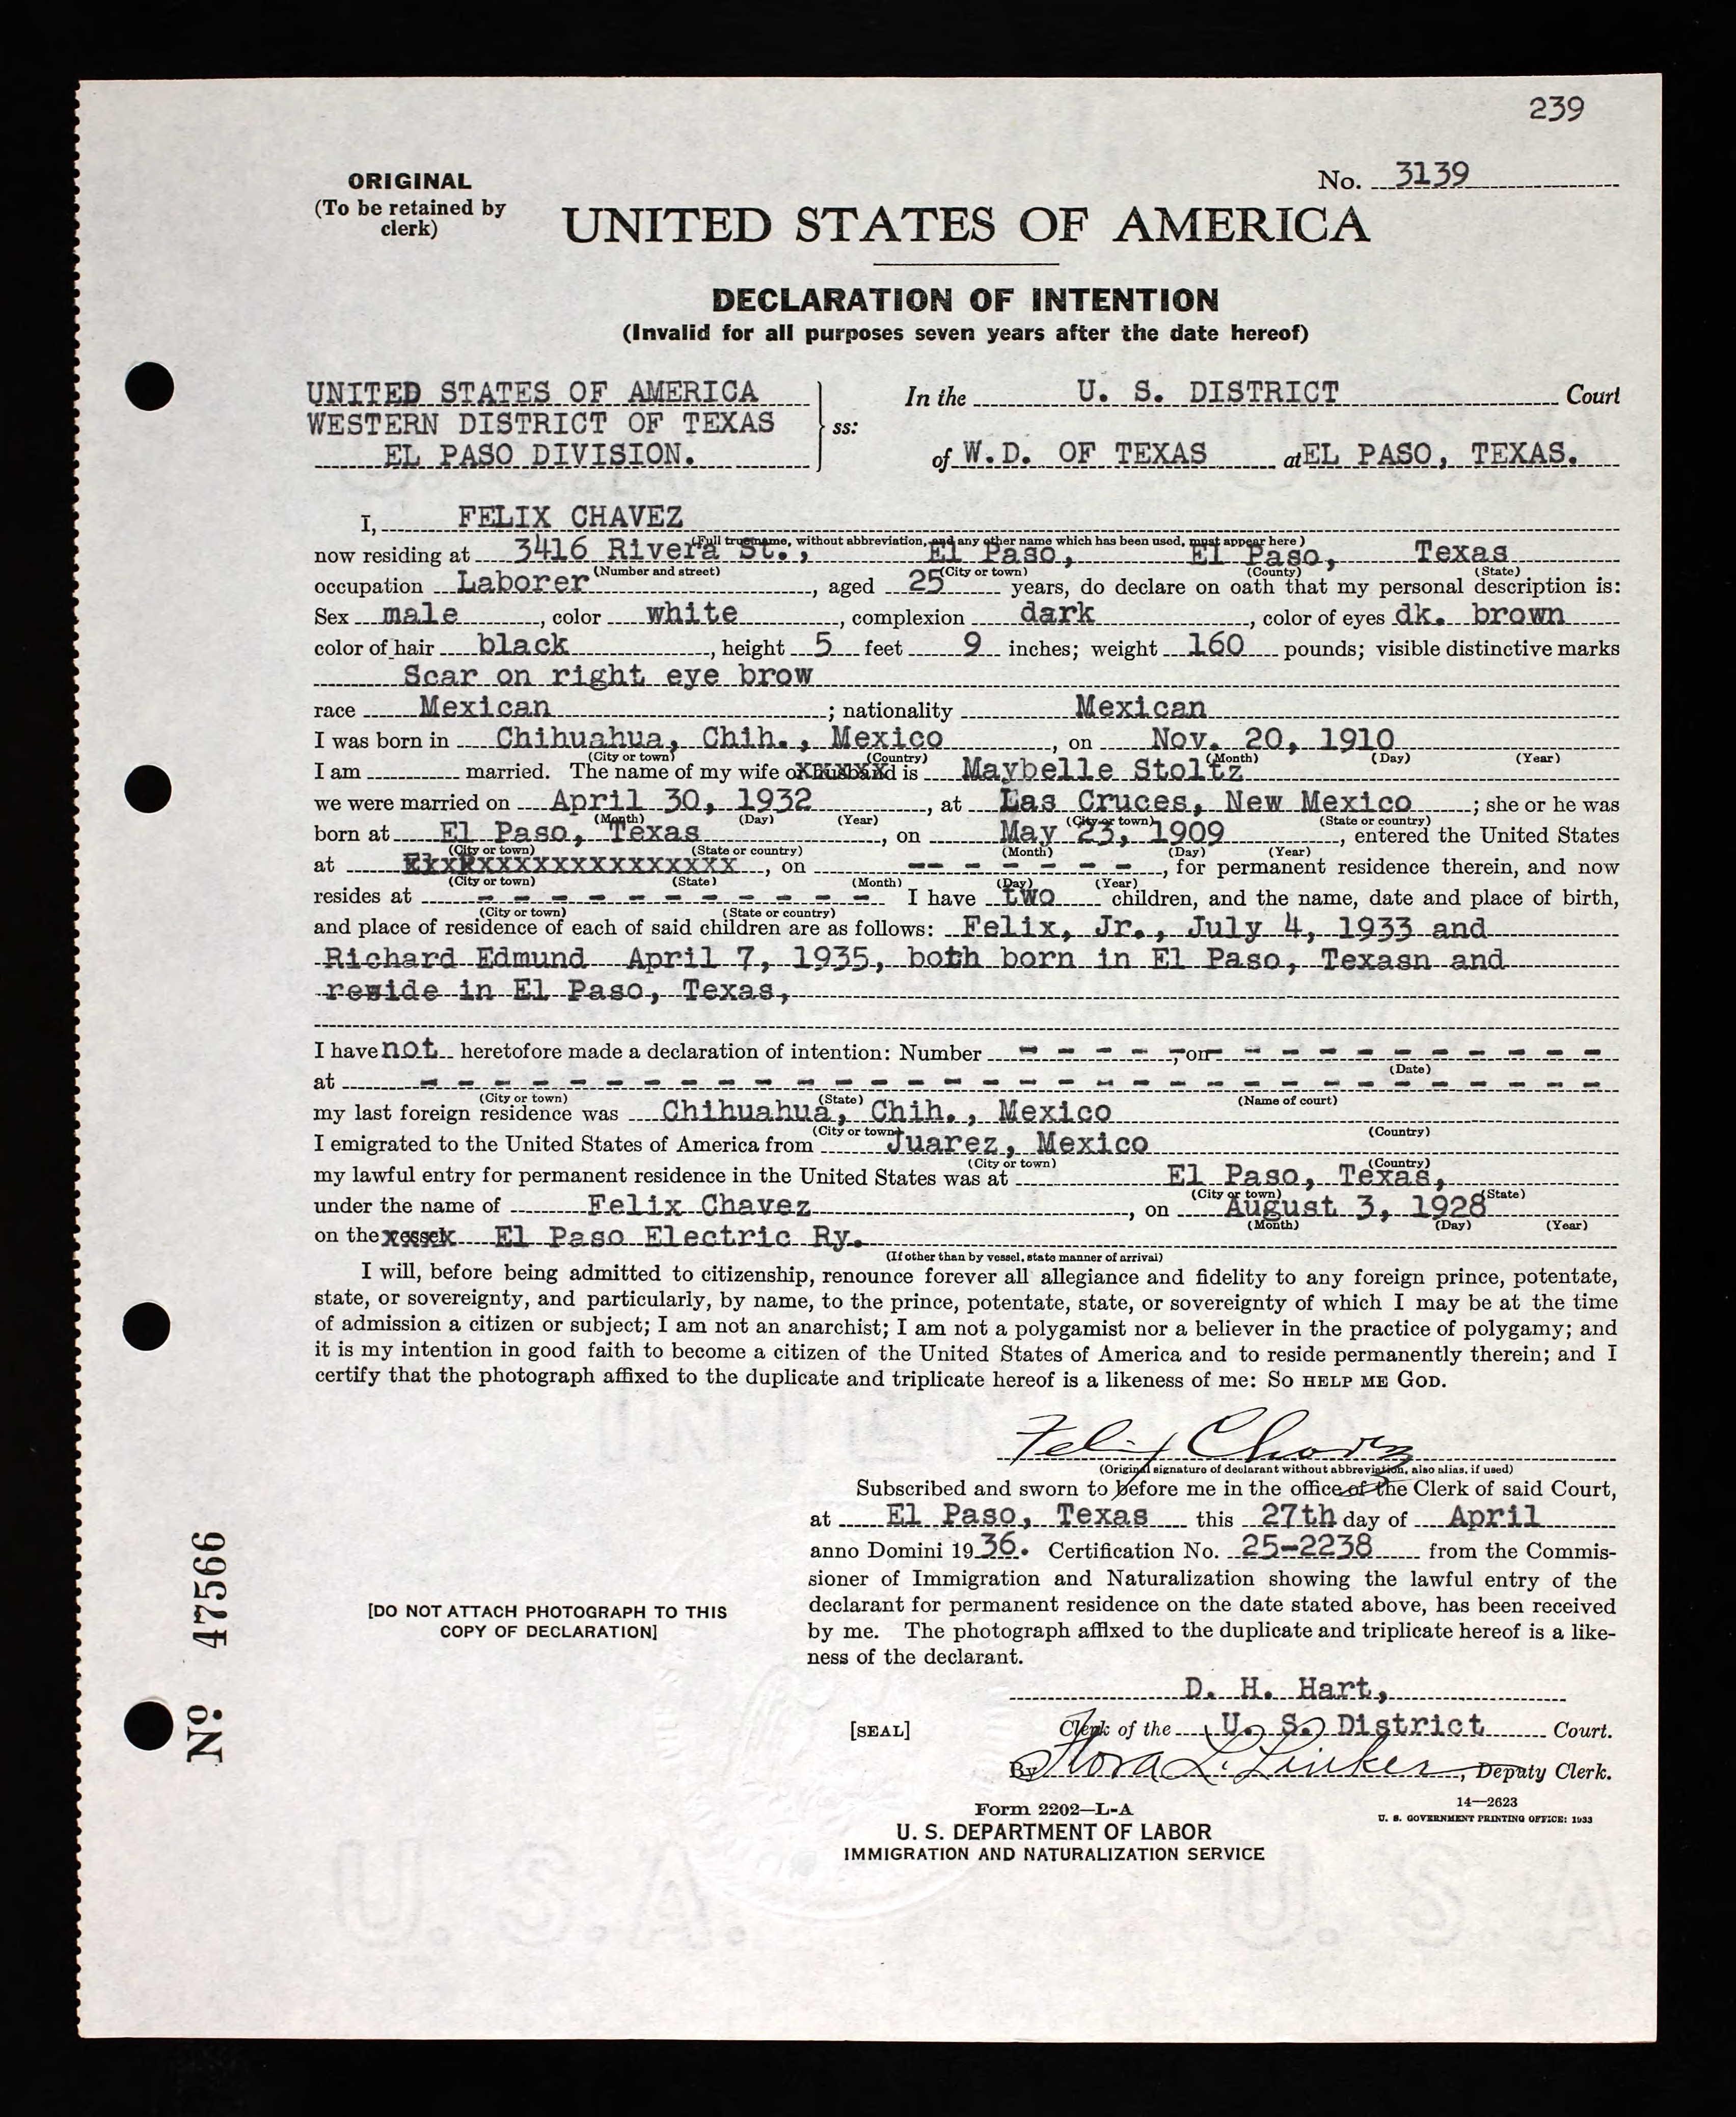 Declaration of Intention for Citizenship for Felix Chavez